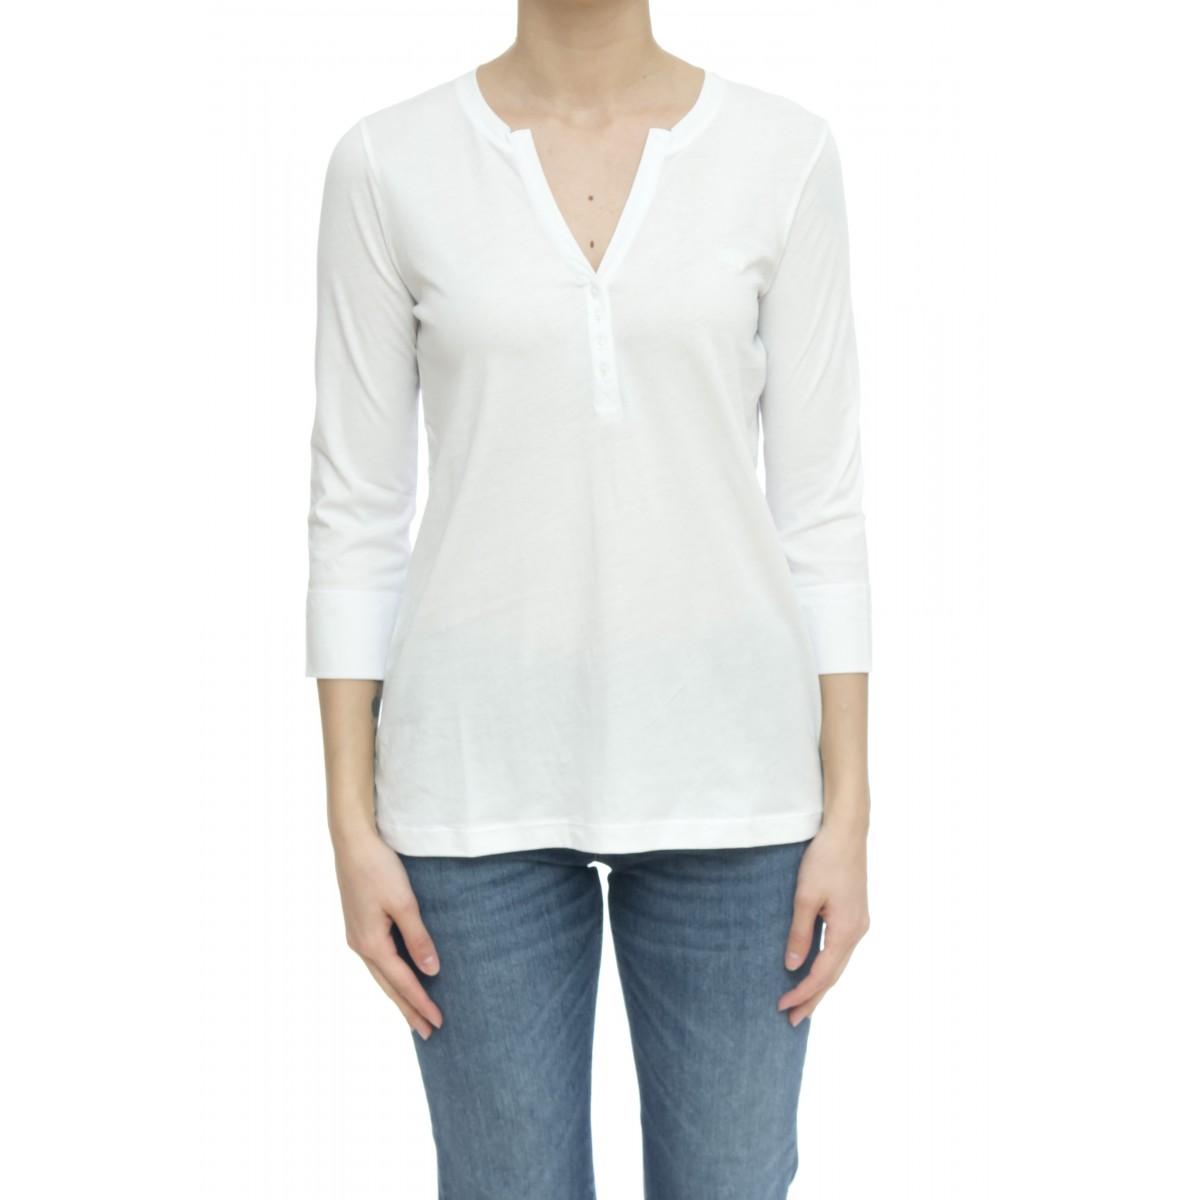 T-shirt - T30211 t-shirt serafino